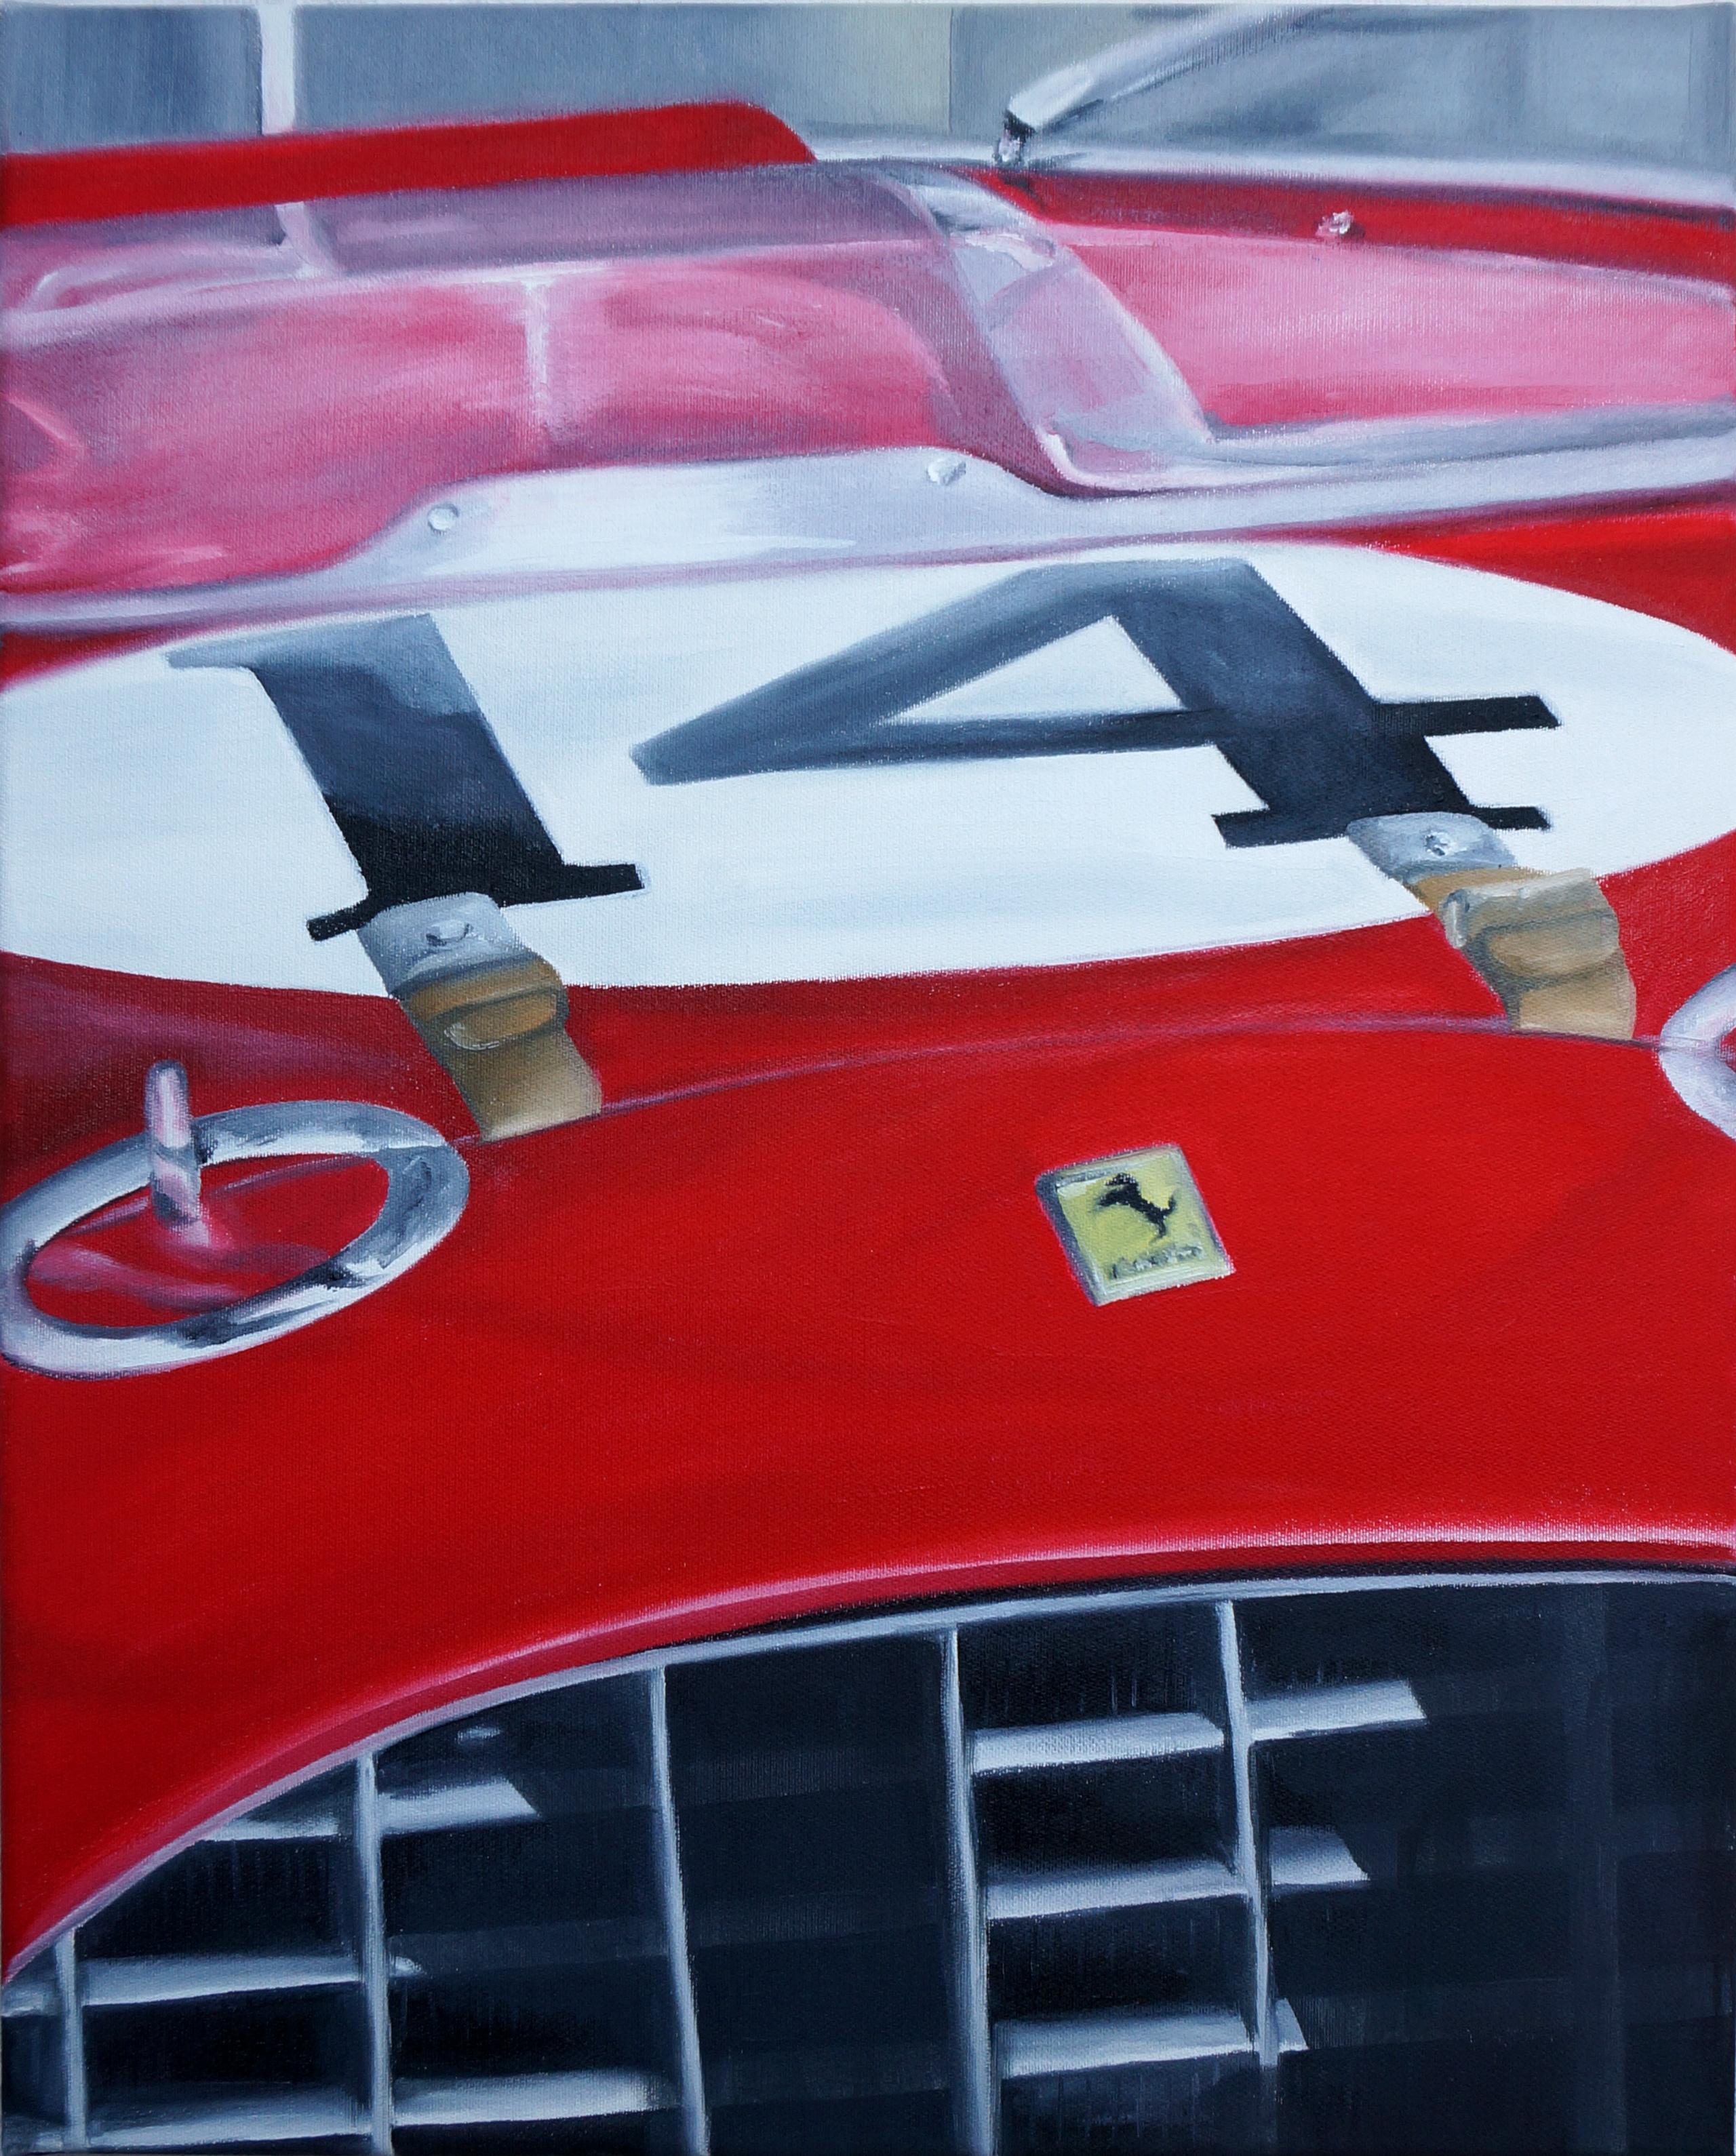 Ferrari No. 14 | Öl auf Leinwand | 50 x 40 cm